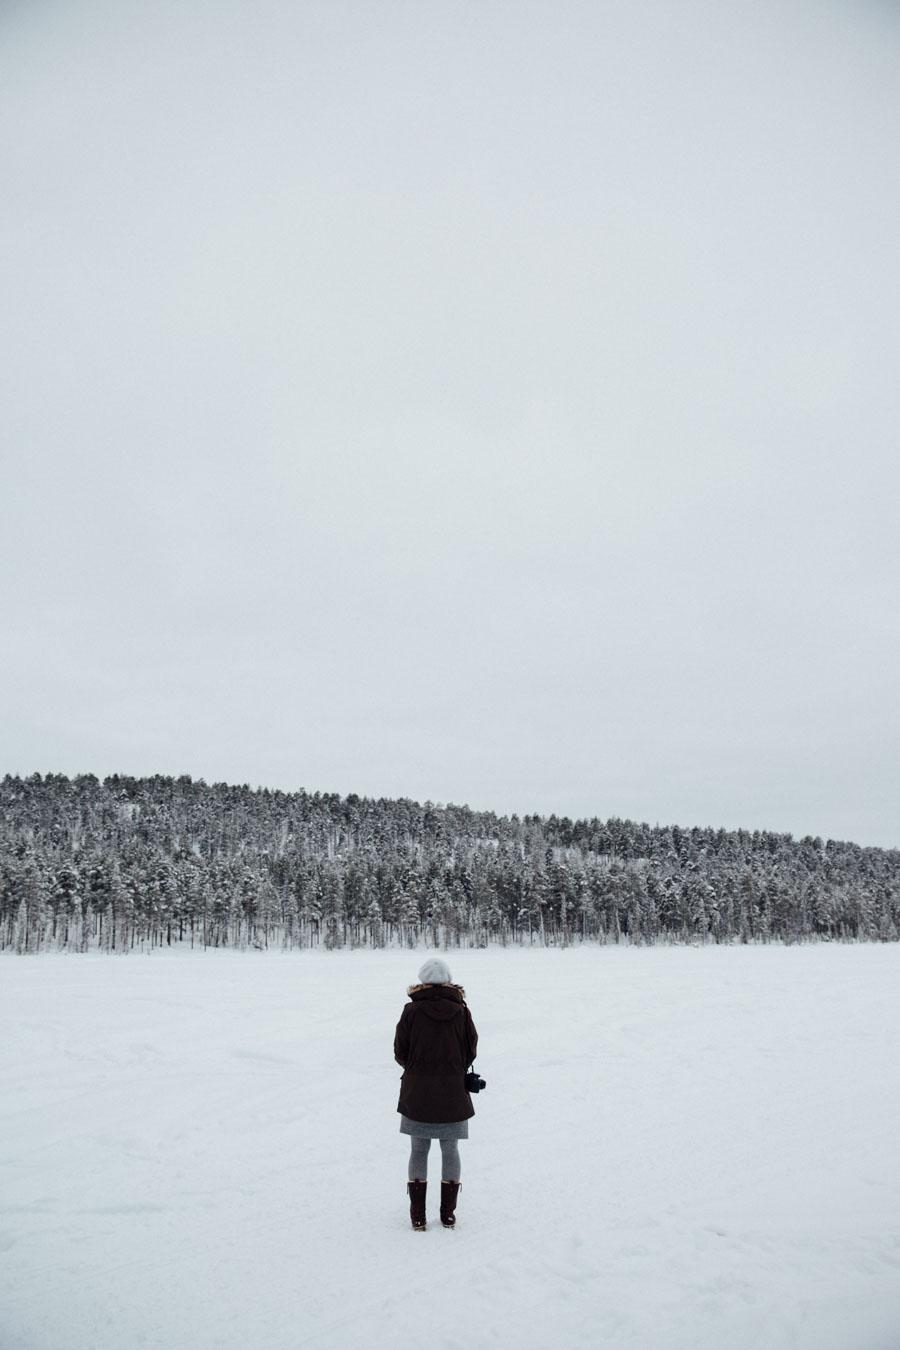 Frozen lake in jokkmokk swedish lapland